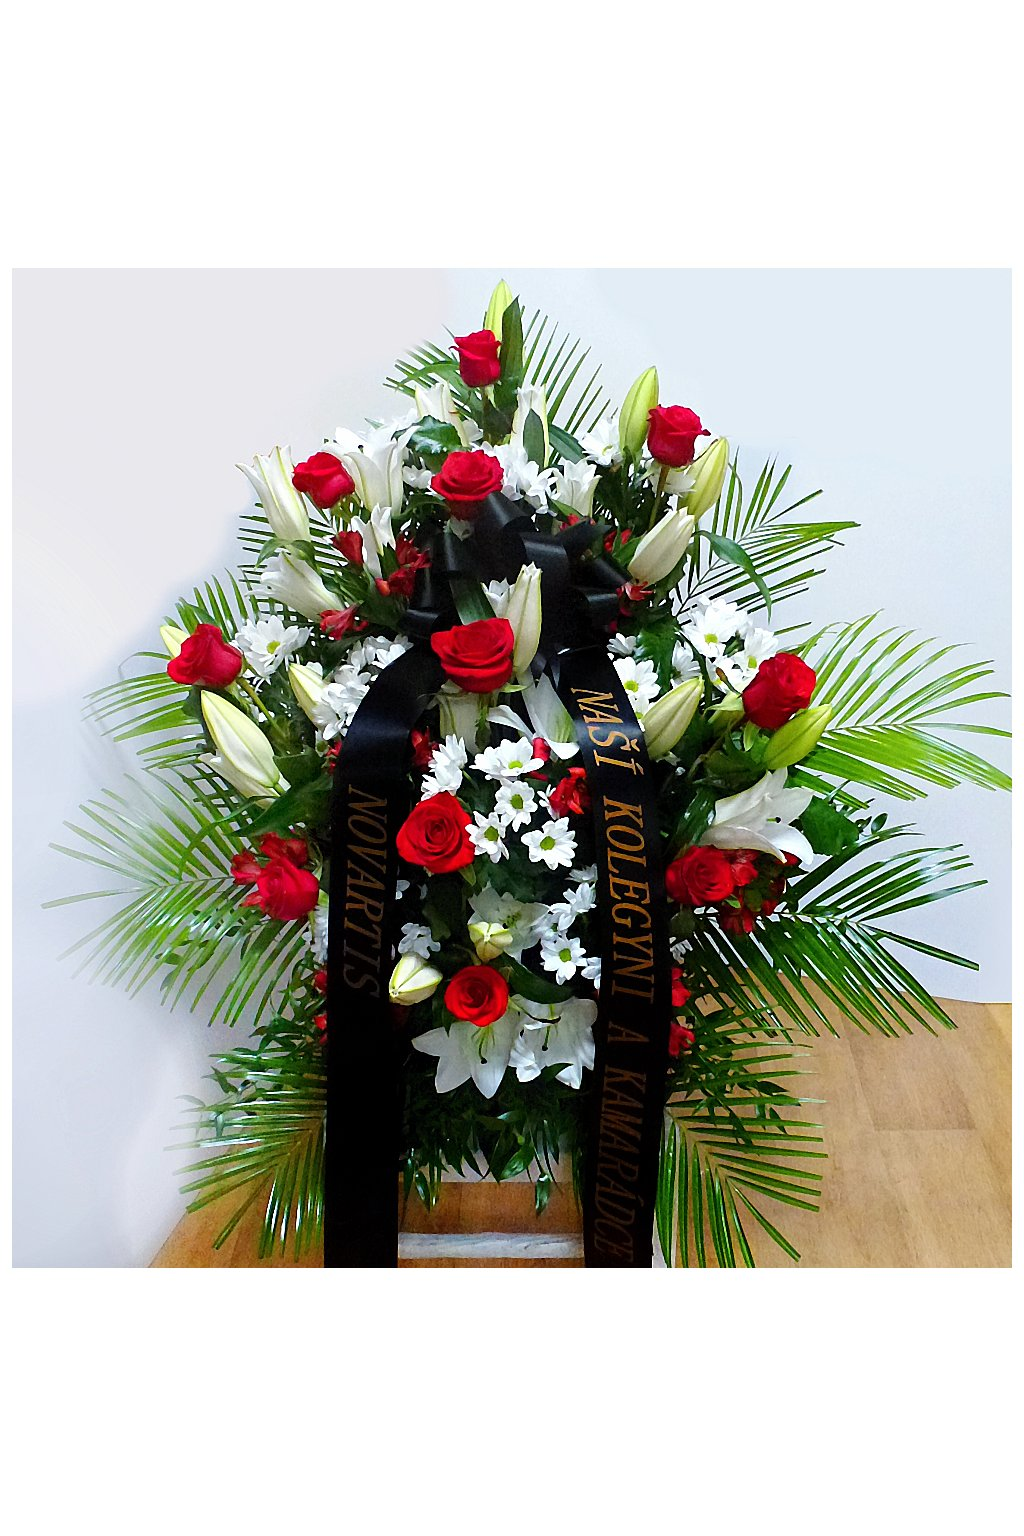 smutecni kytice vypichovana do drzaku kvetinarstvi arnapi